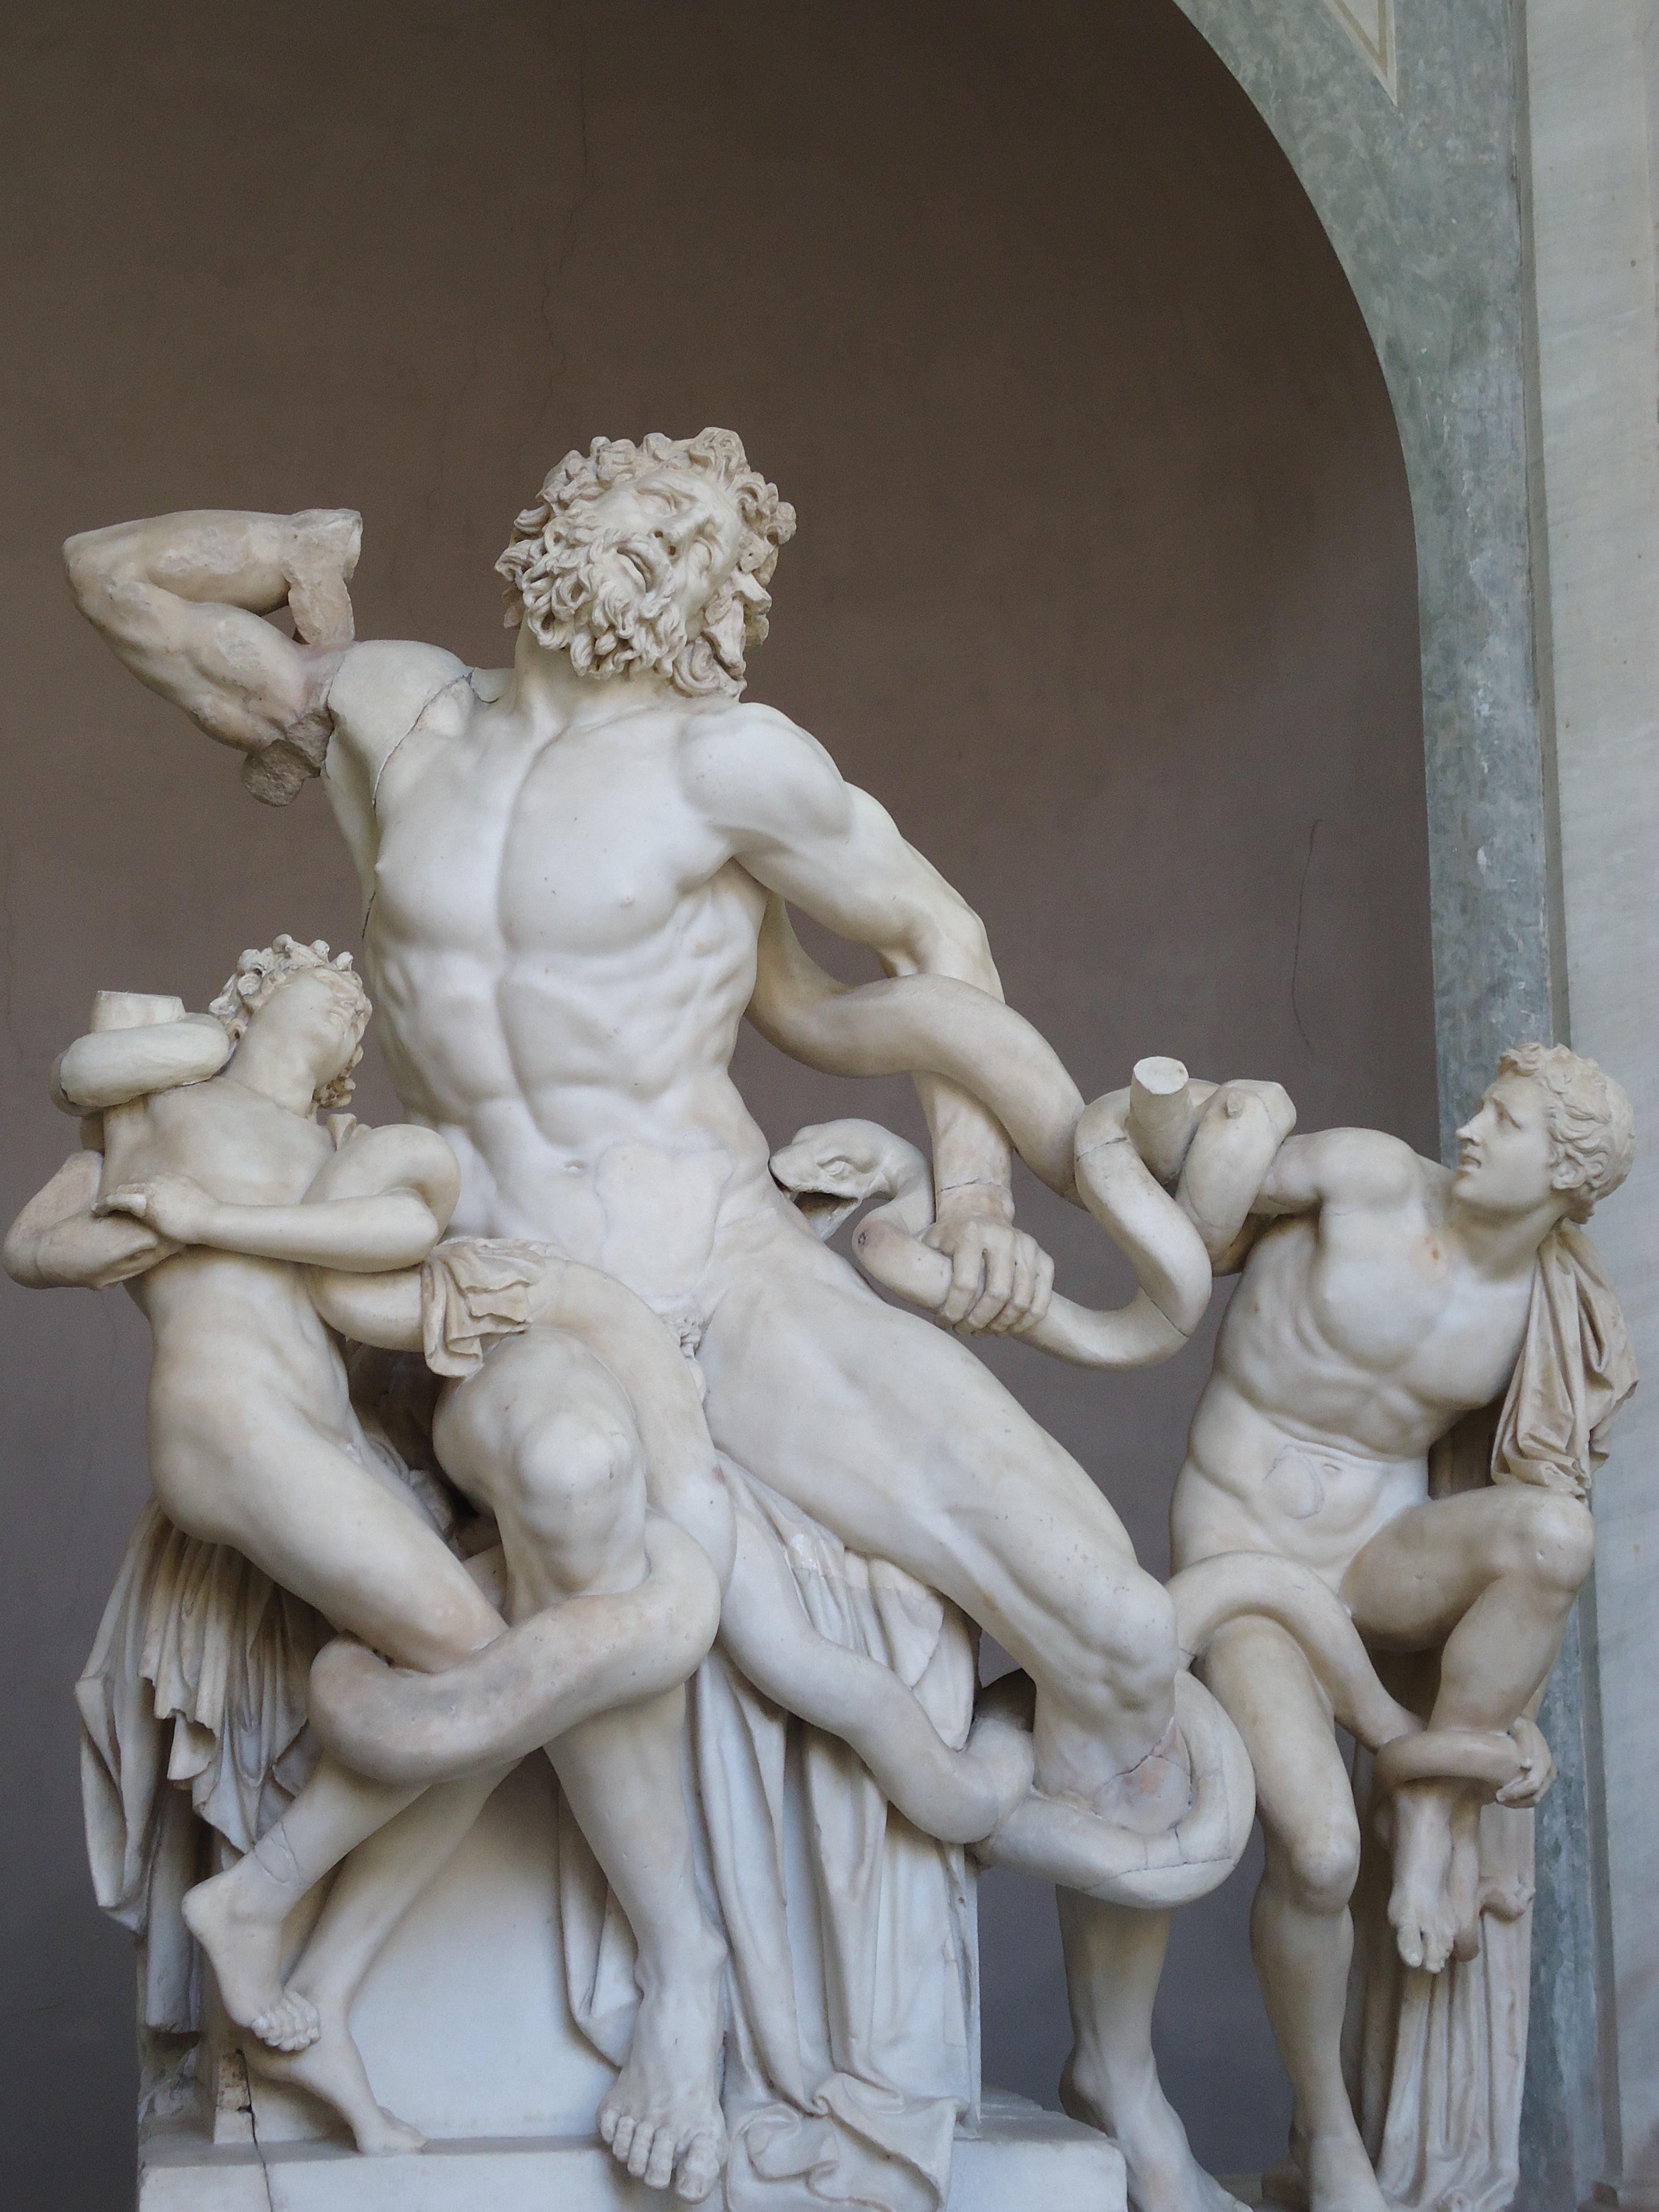 Laocoöngroep - Vaticaans museum - Rome